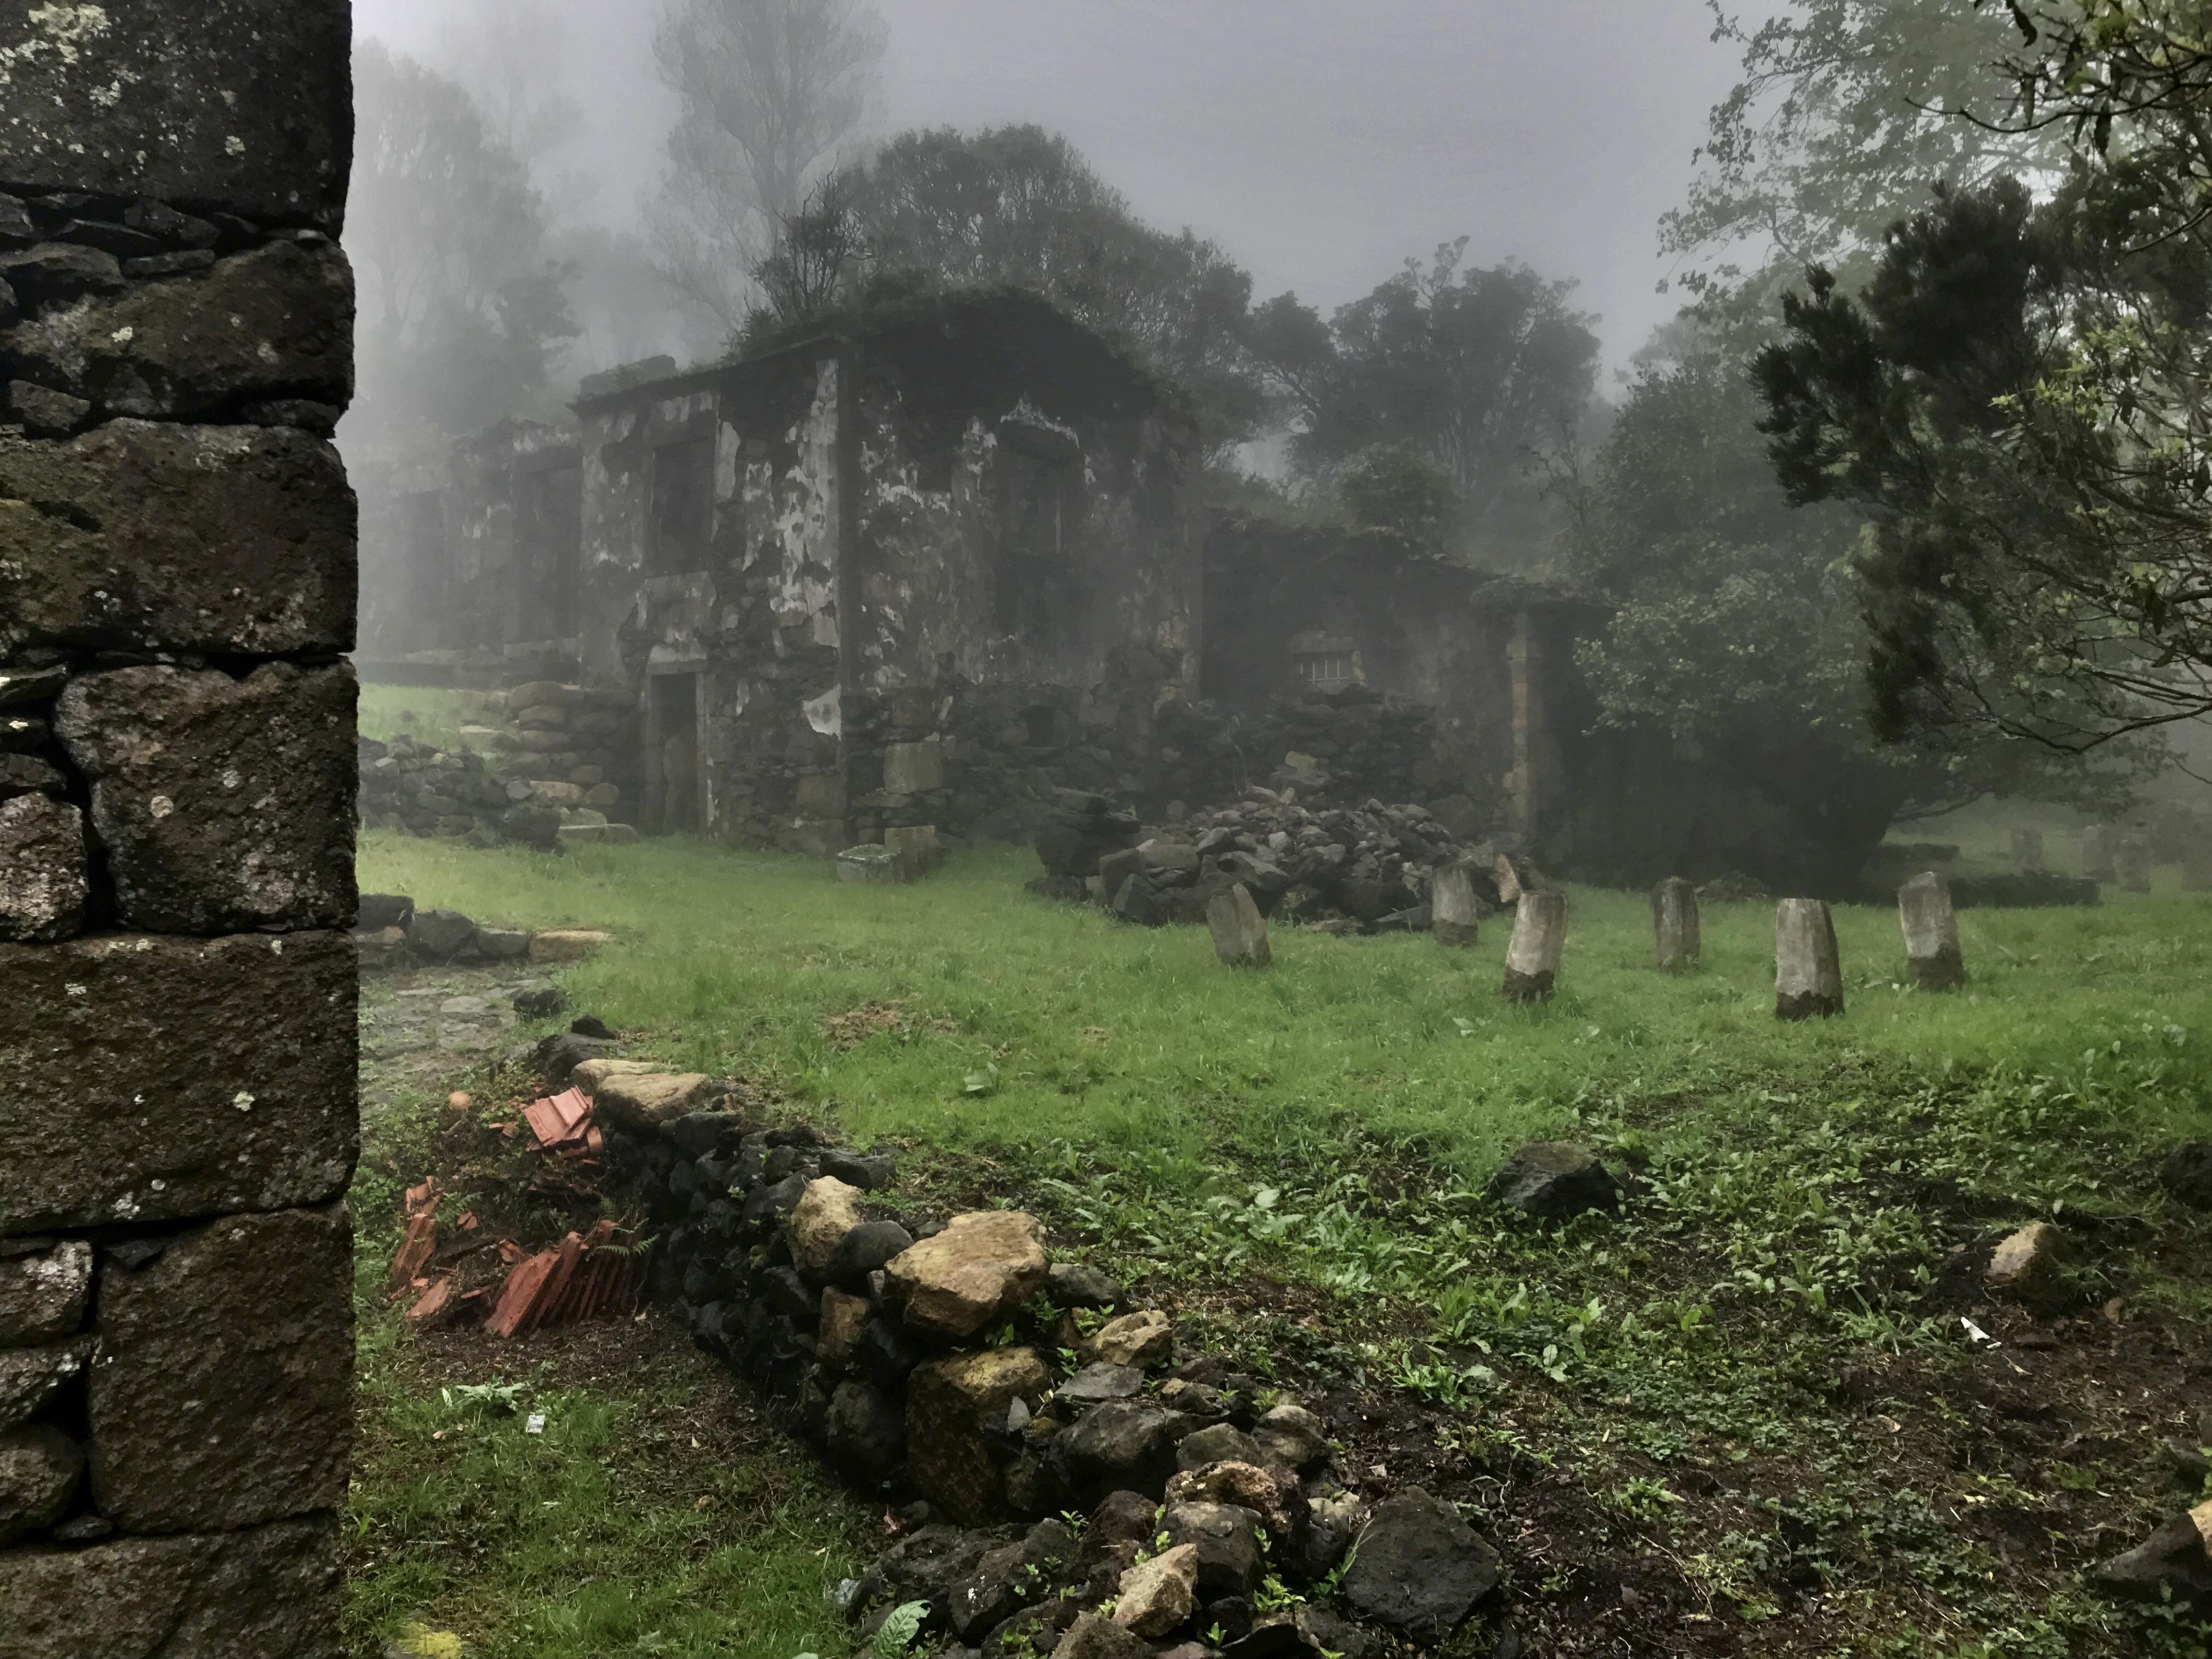 Casa das Figueiras and Casa das Flores under the mist